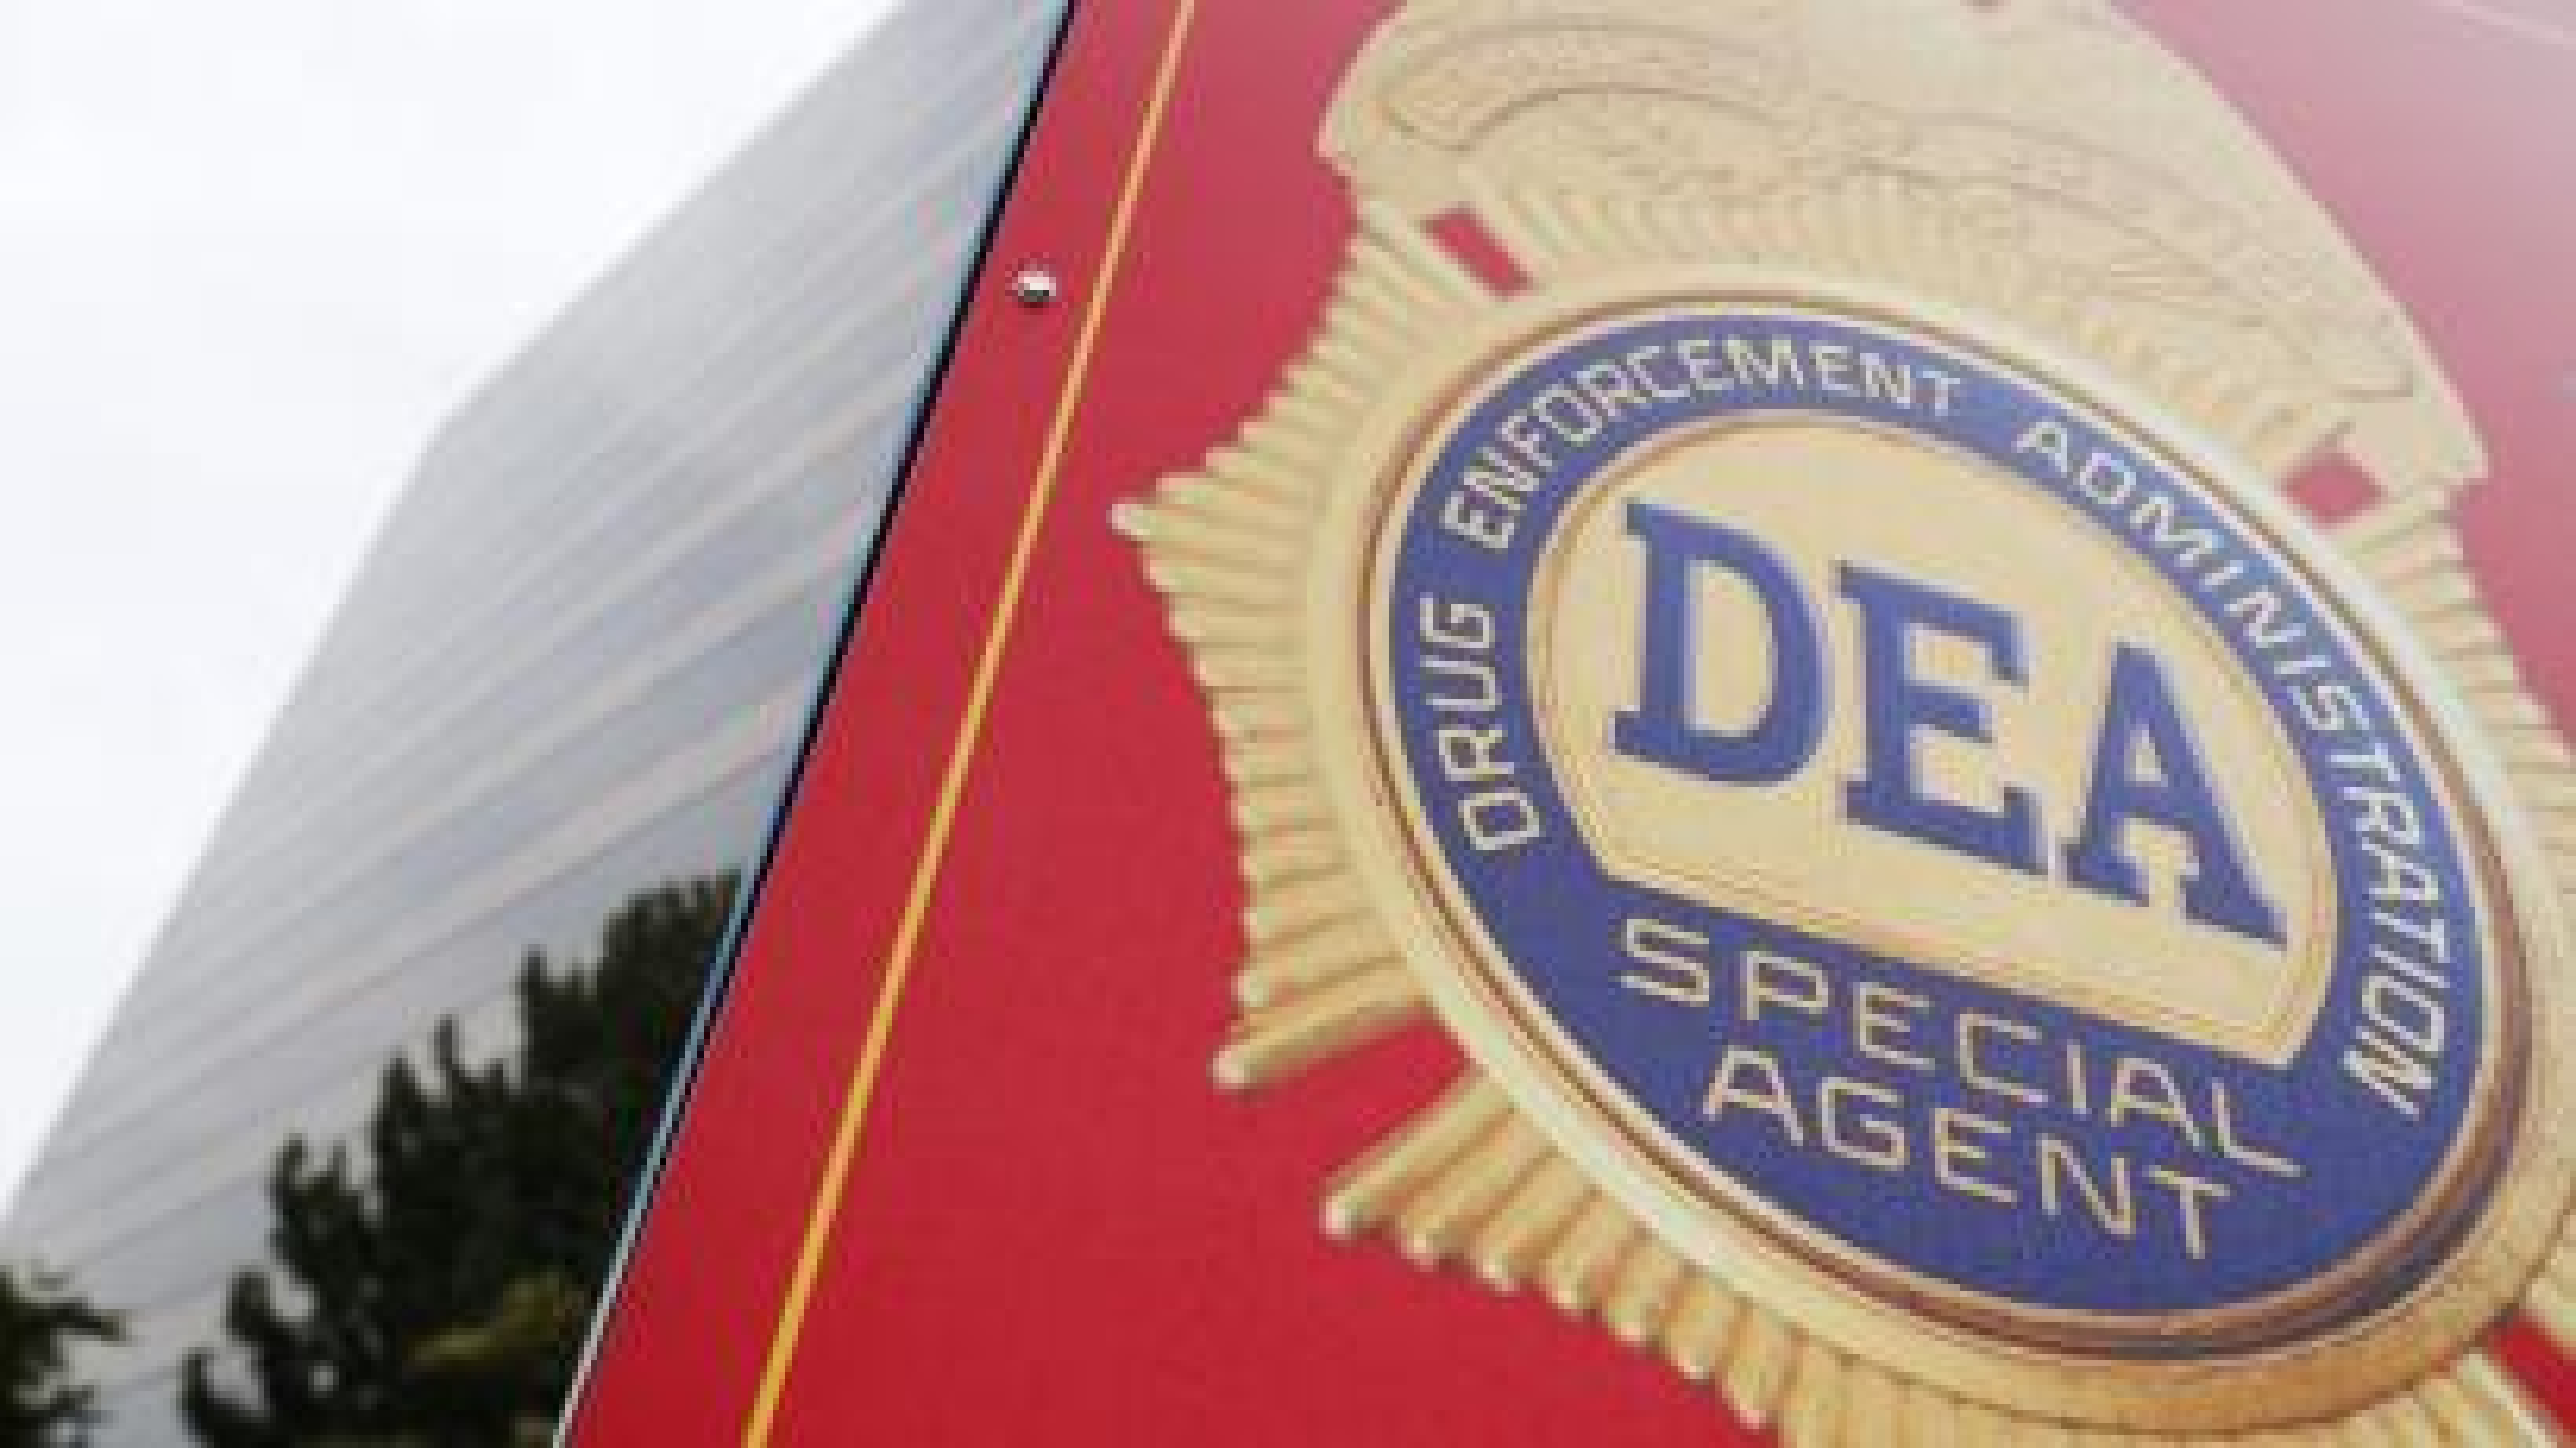 A sign with a DEA badge